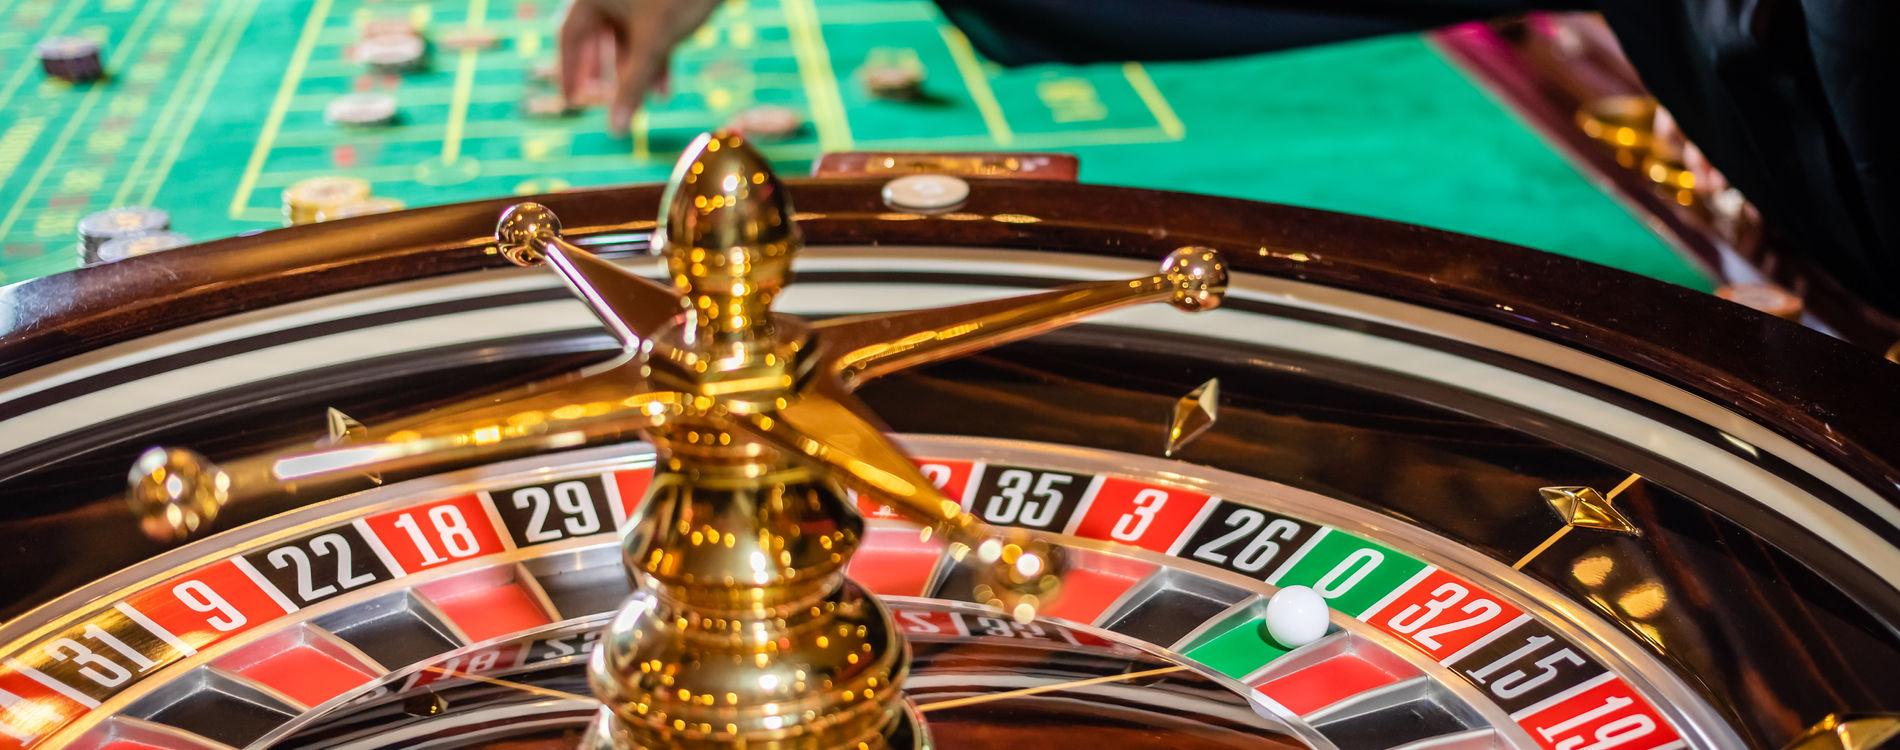 Sun casino monaco poker casino game ladbrokes